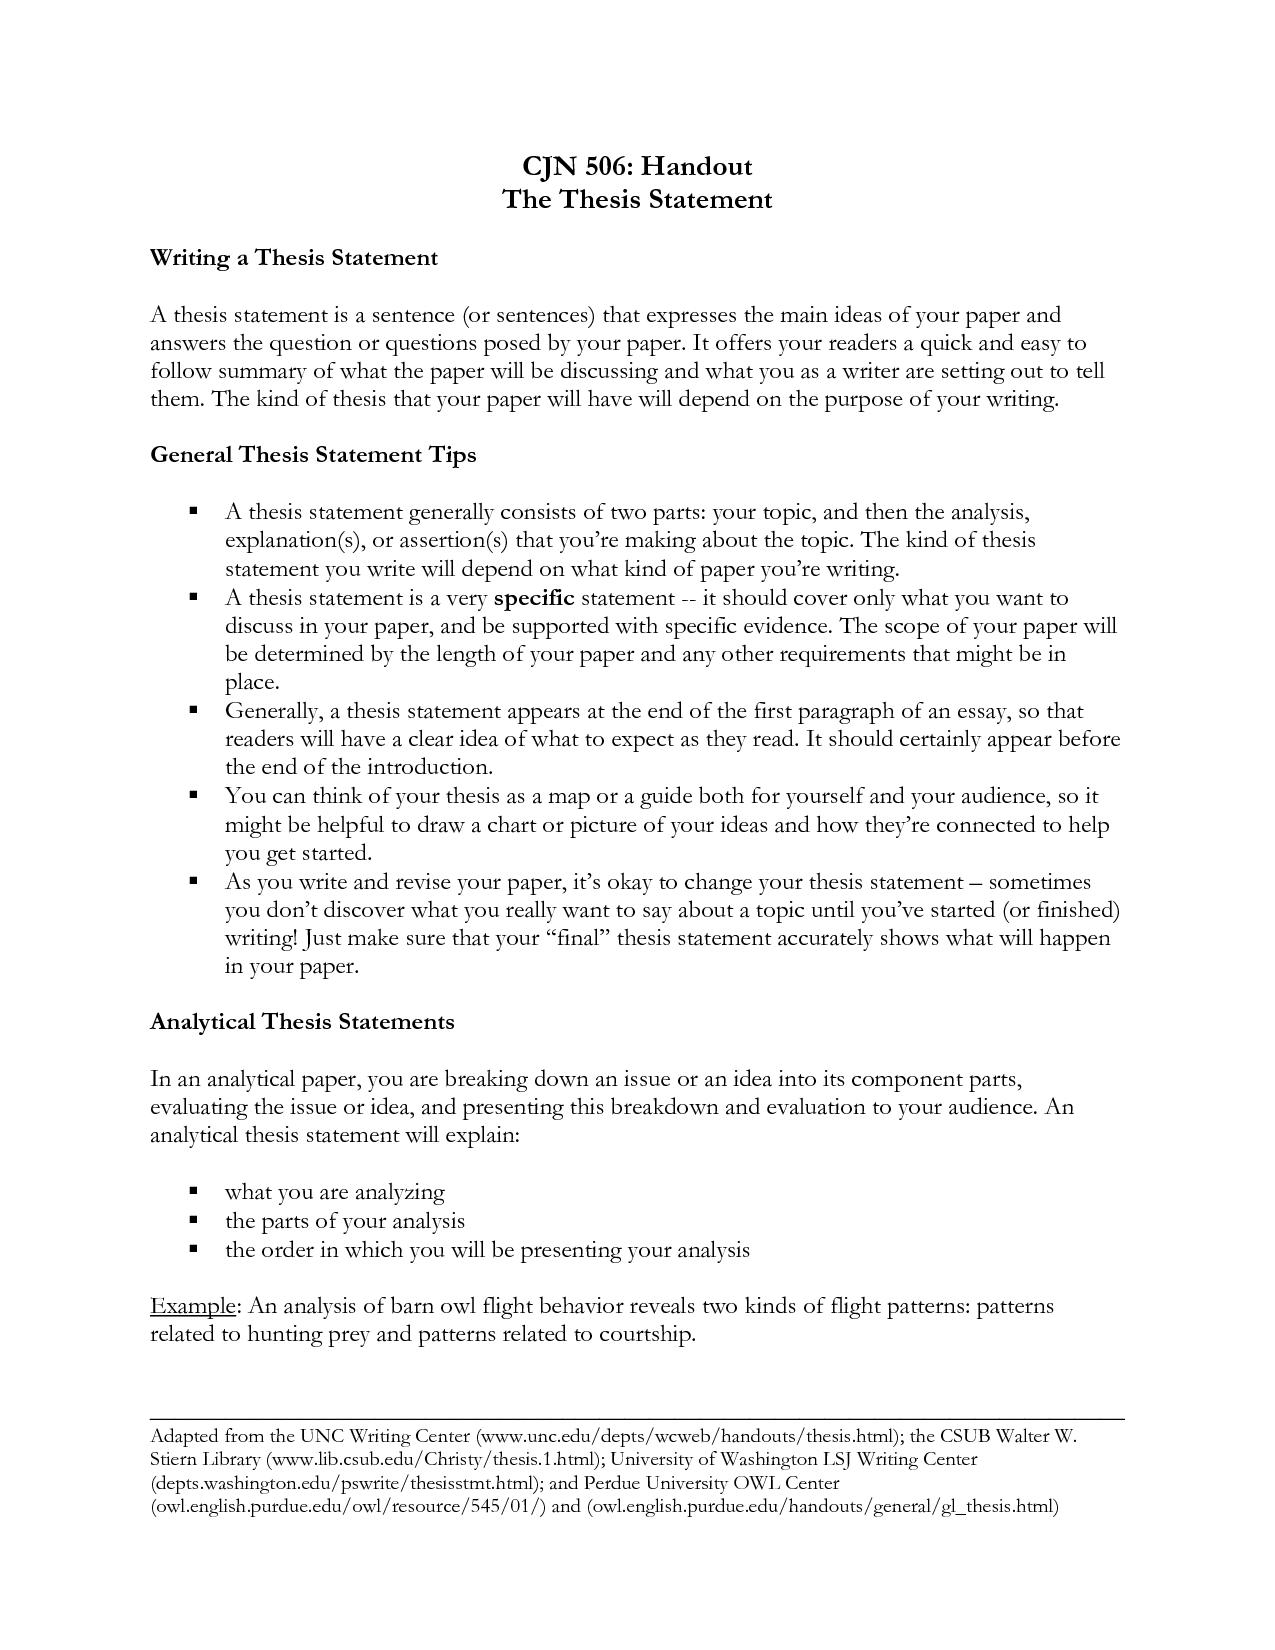 Elementary essay contest